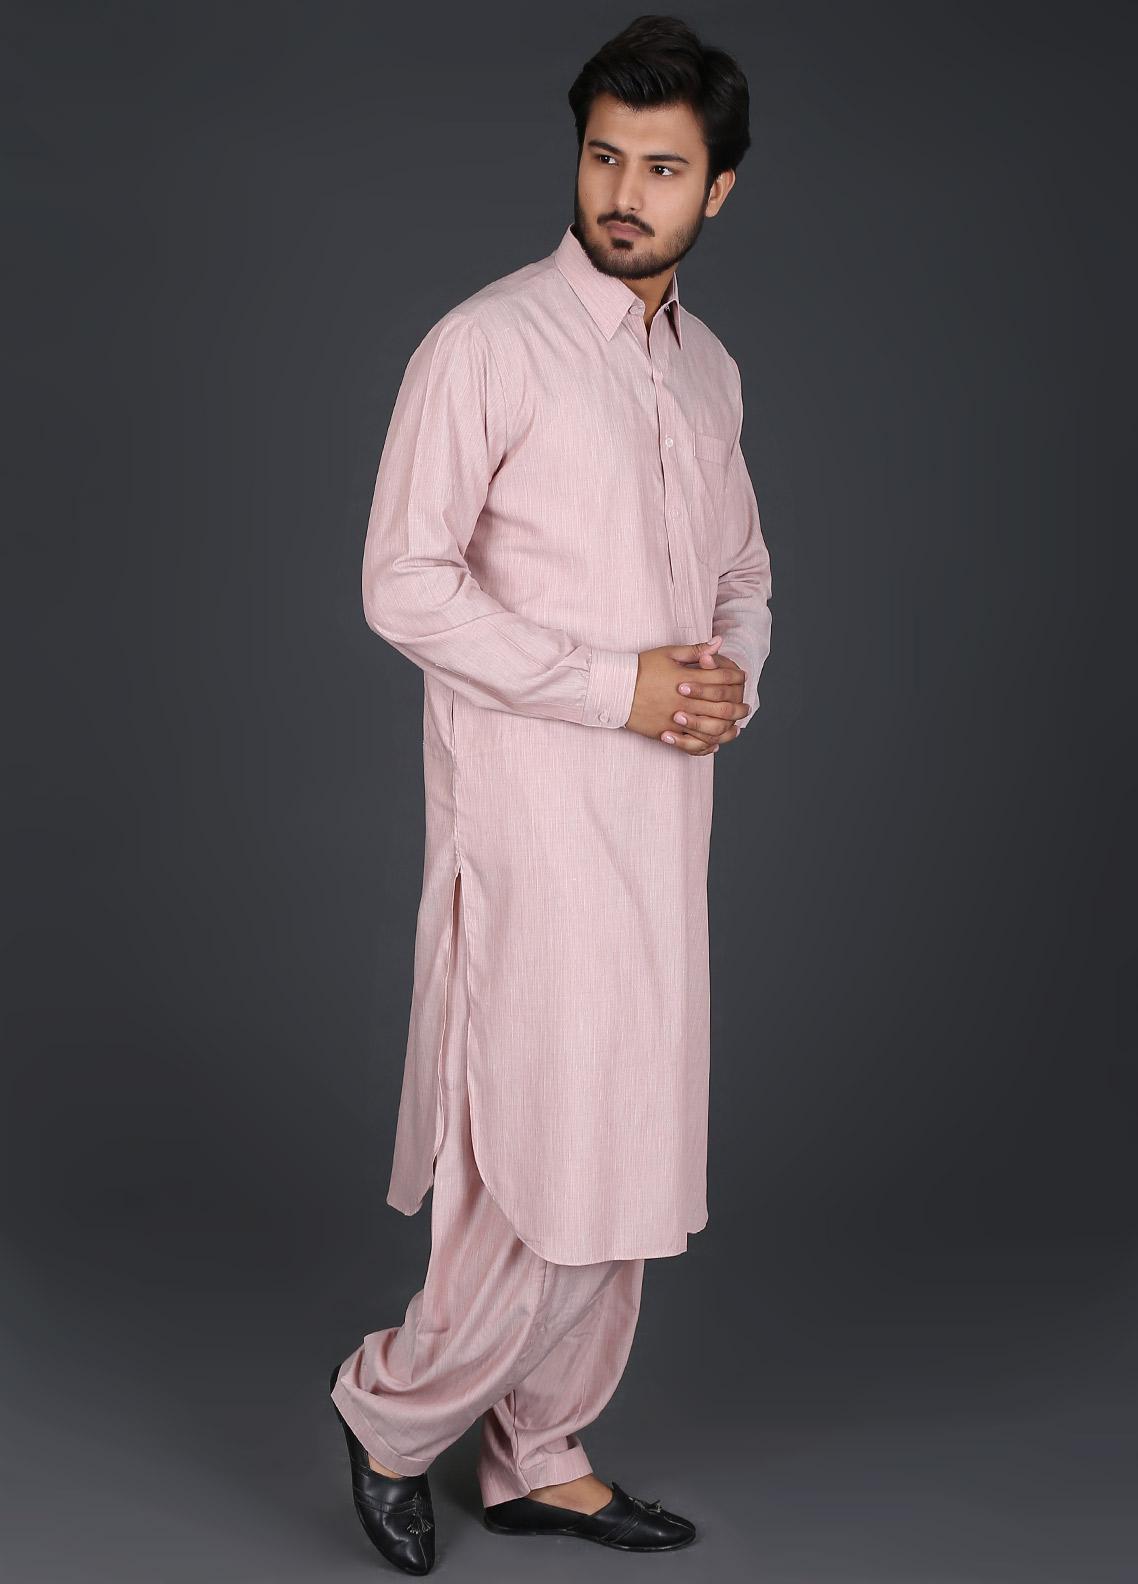 Sanaulla Exclusive Range Cotton Formal Kameez Shalwar for Men -  P-15 Rust